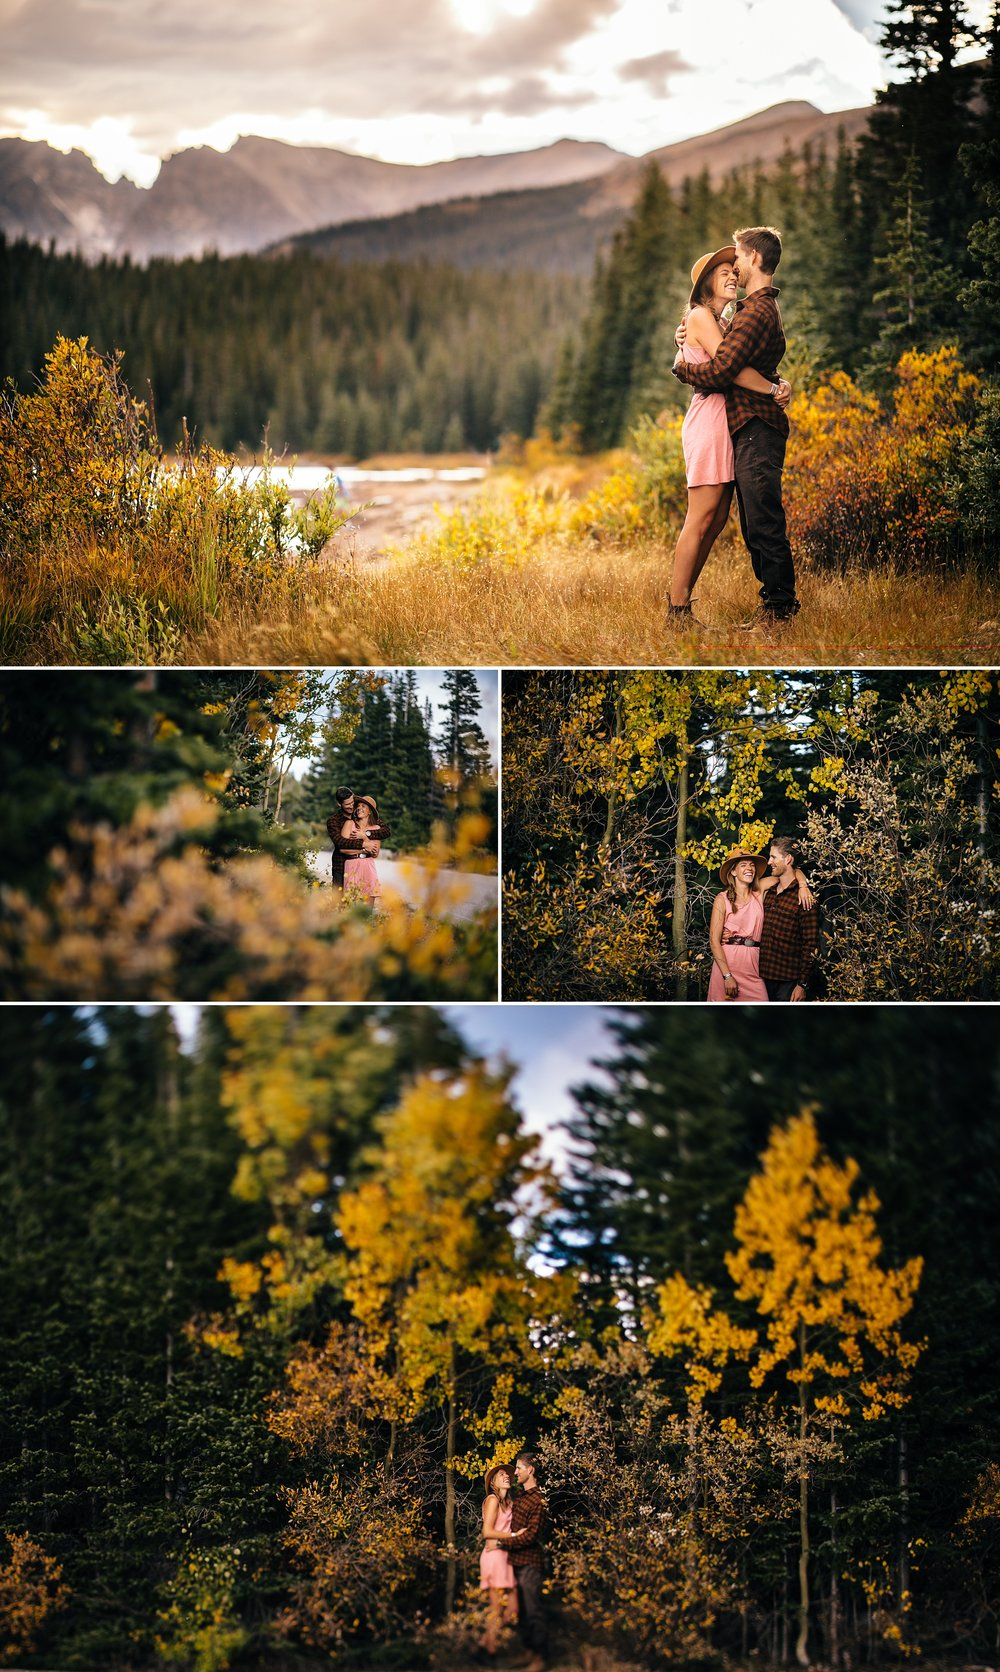 Emma+Taylor-Brainard-Lake-Engagement-Session-0001_WEB.jpg